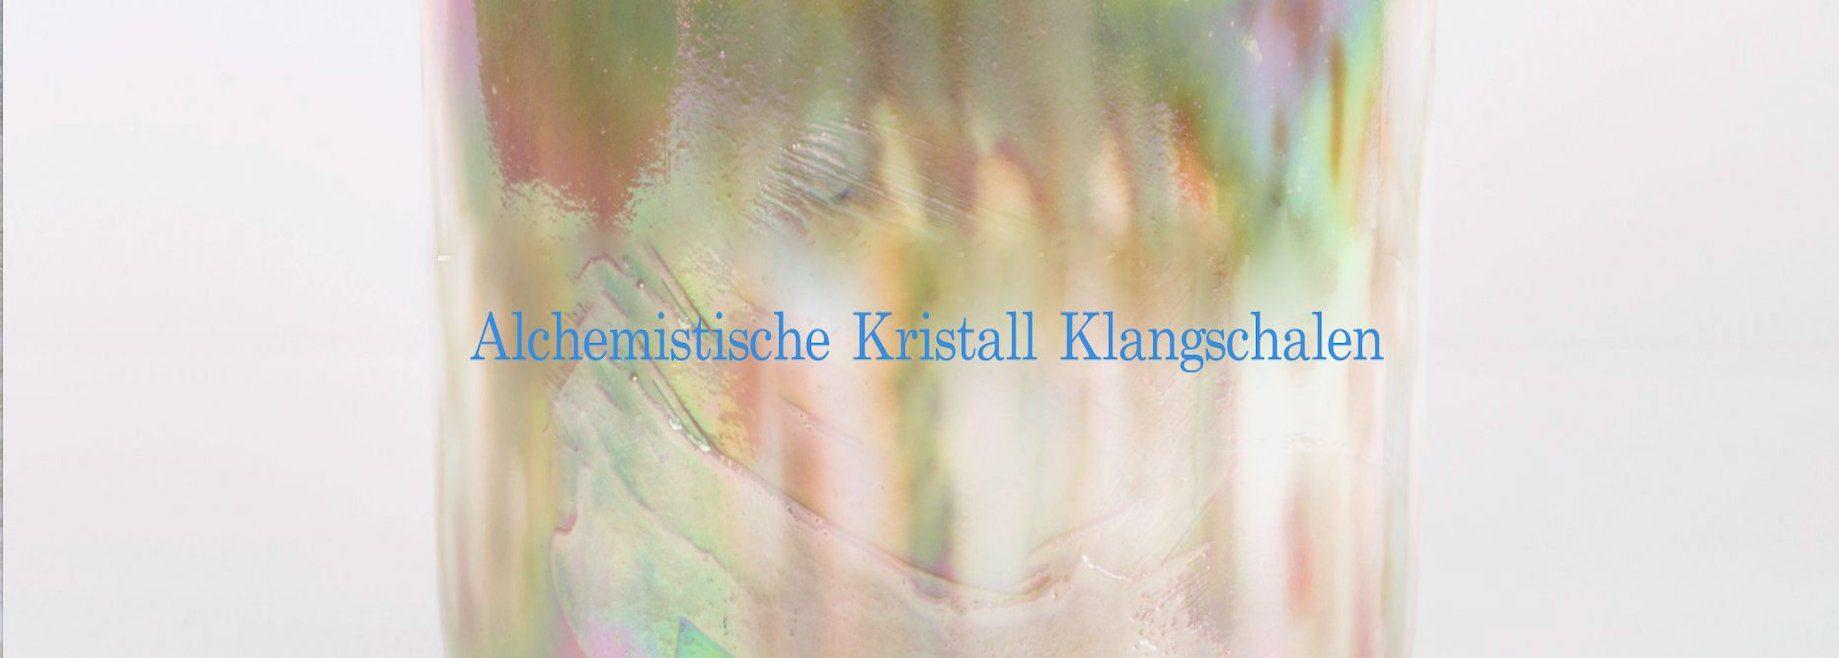 http://atlantis4u-shoppingwelt.de/wp-content/uploads/2019/09/Alchemie1.jpg